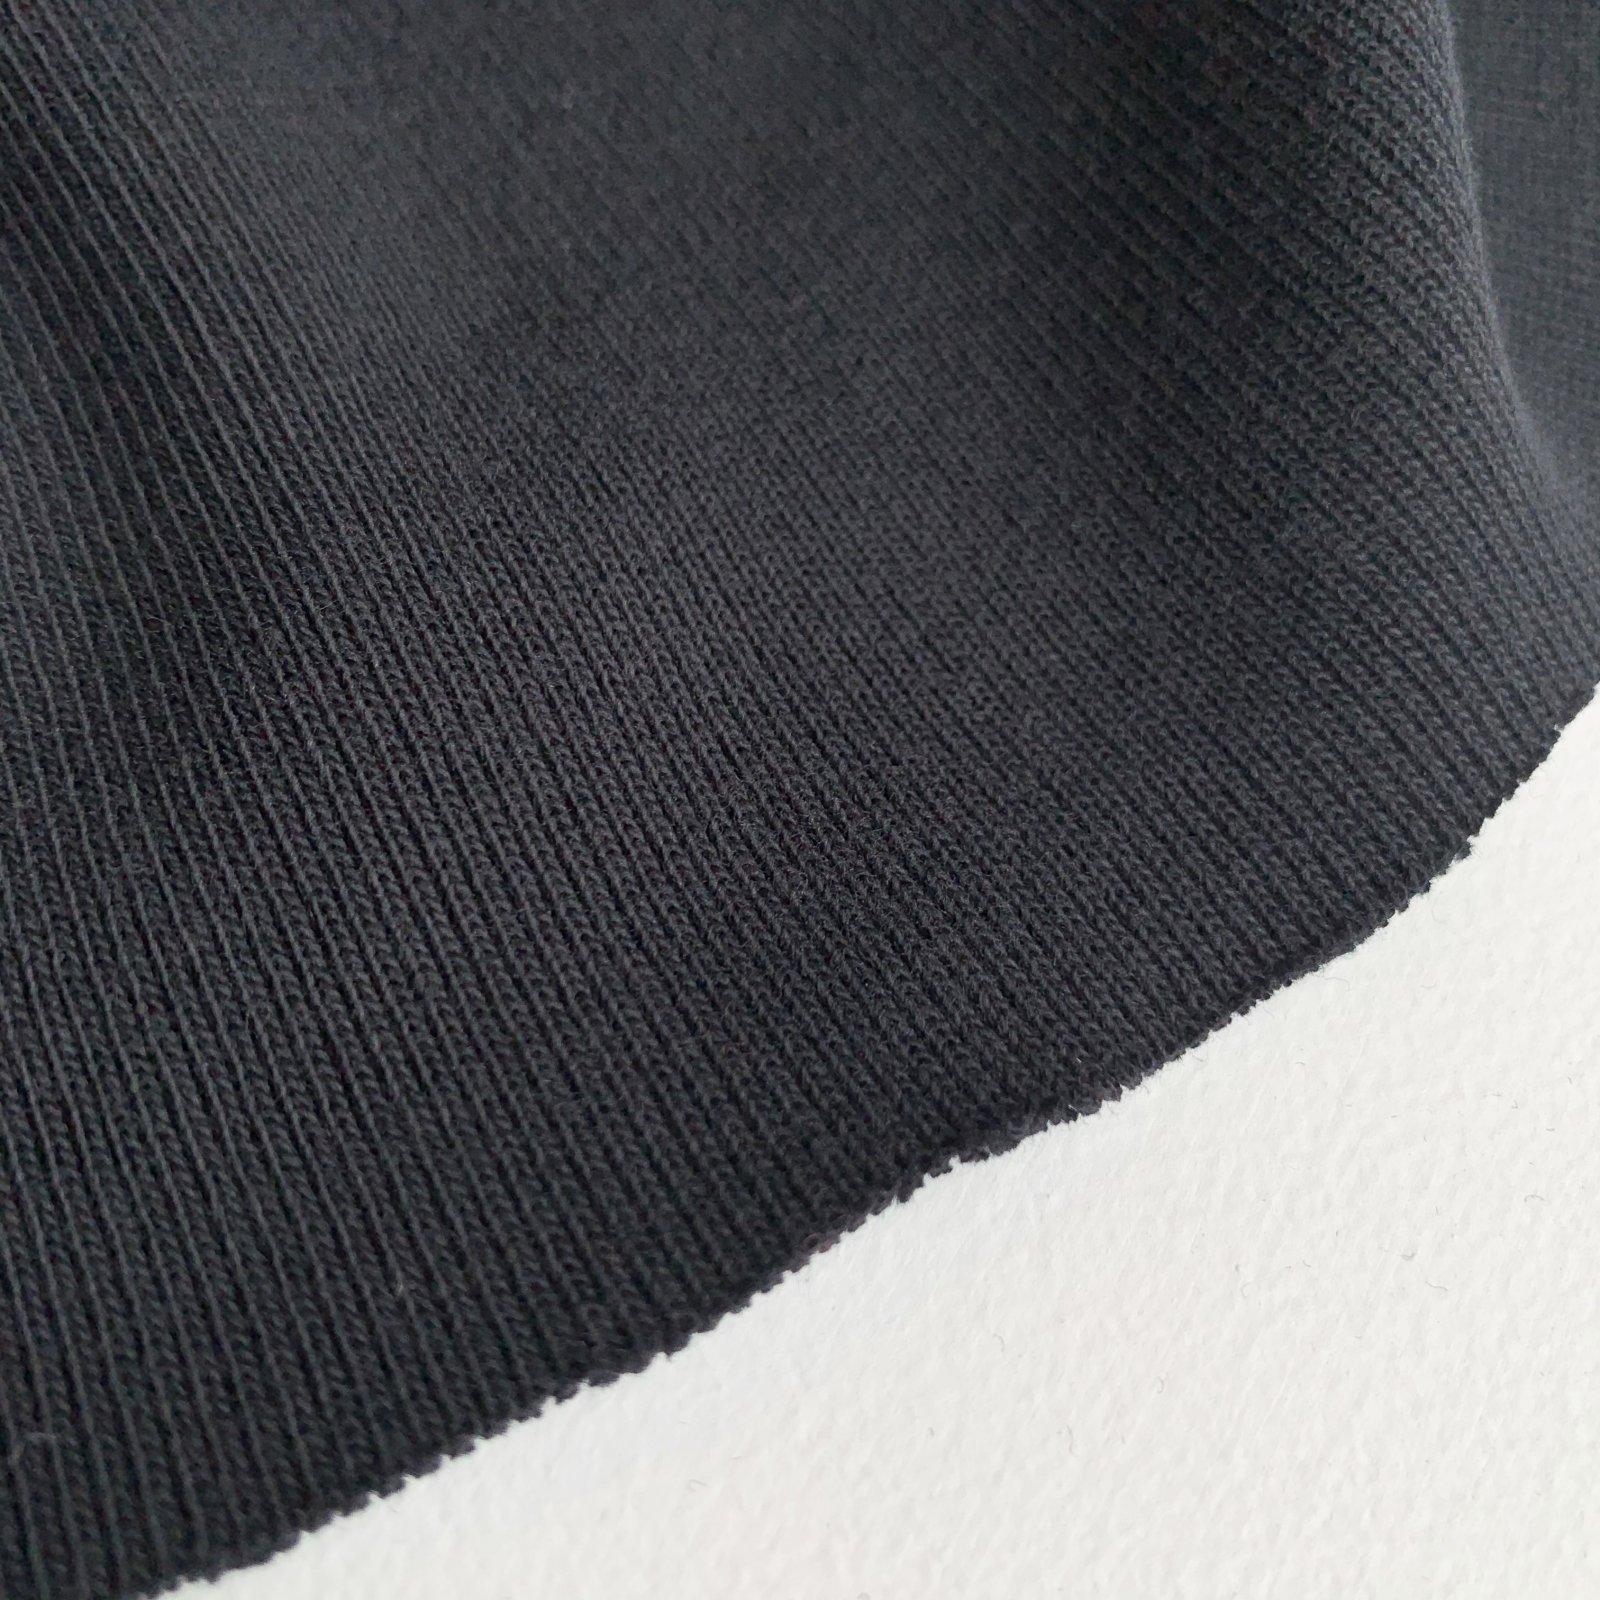 Oeko Tex Certified Cotton Ribbing 1x1 - Black 59